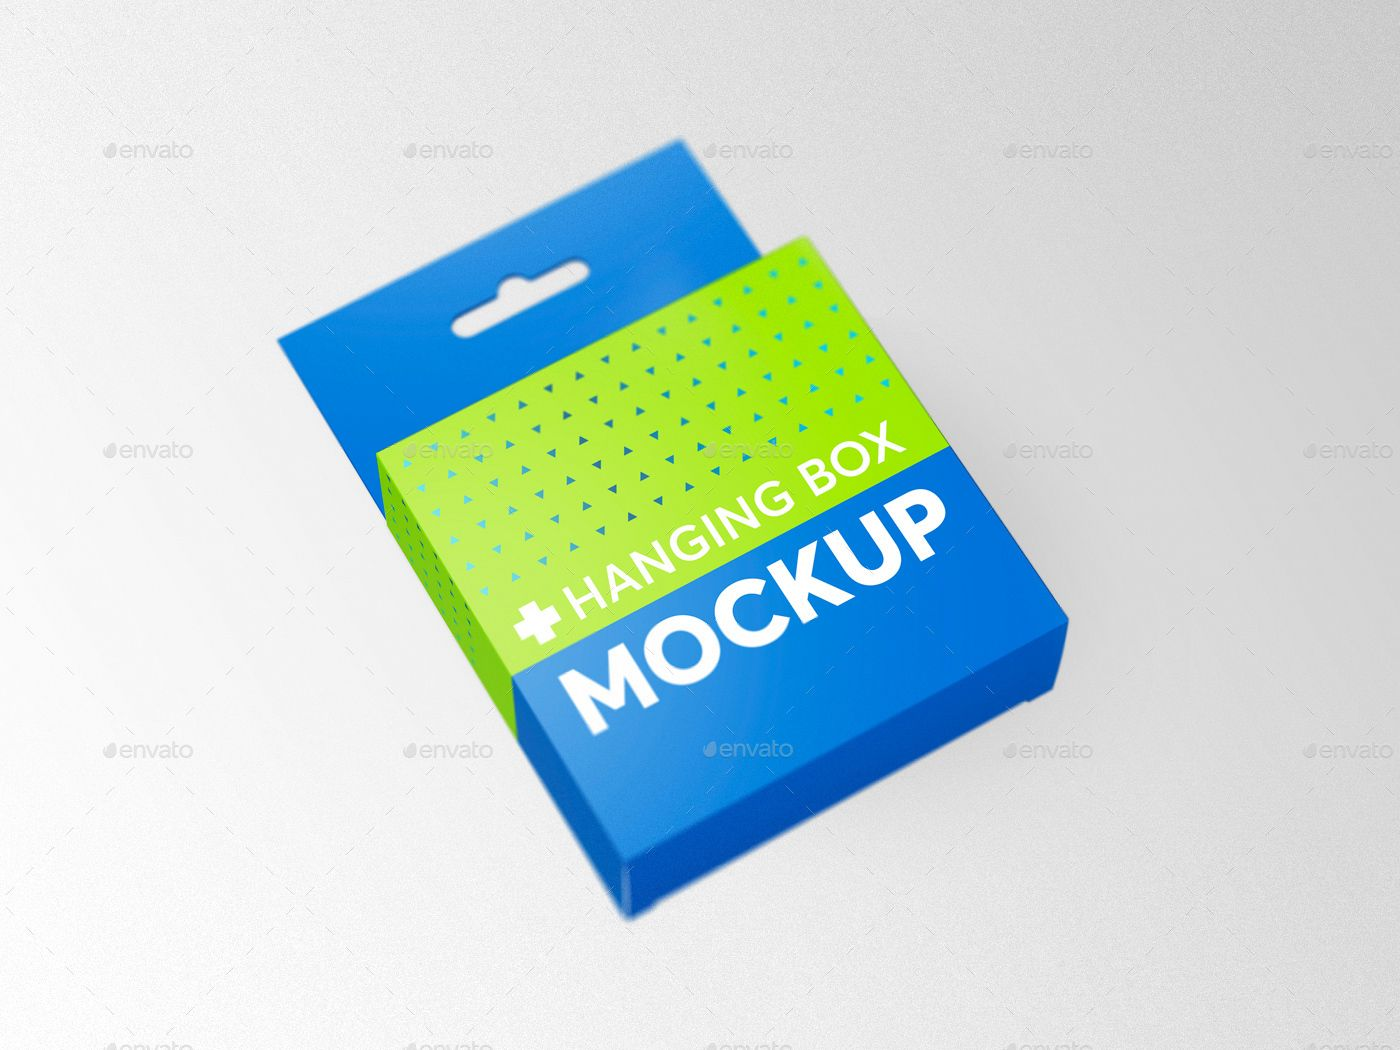 Download Hanging Flat Square Box Mockups Box Mockup Box Packaging Design Graphic Design Tutorials